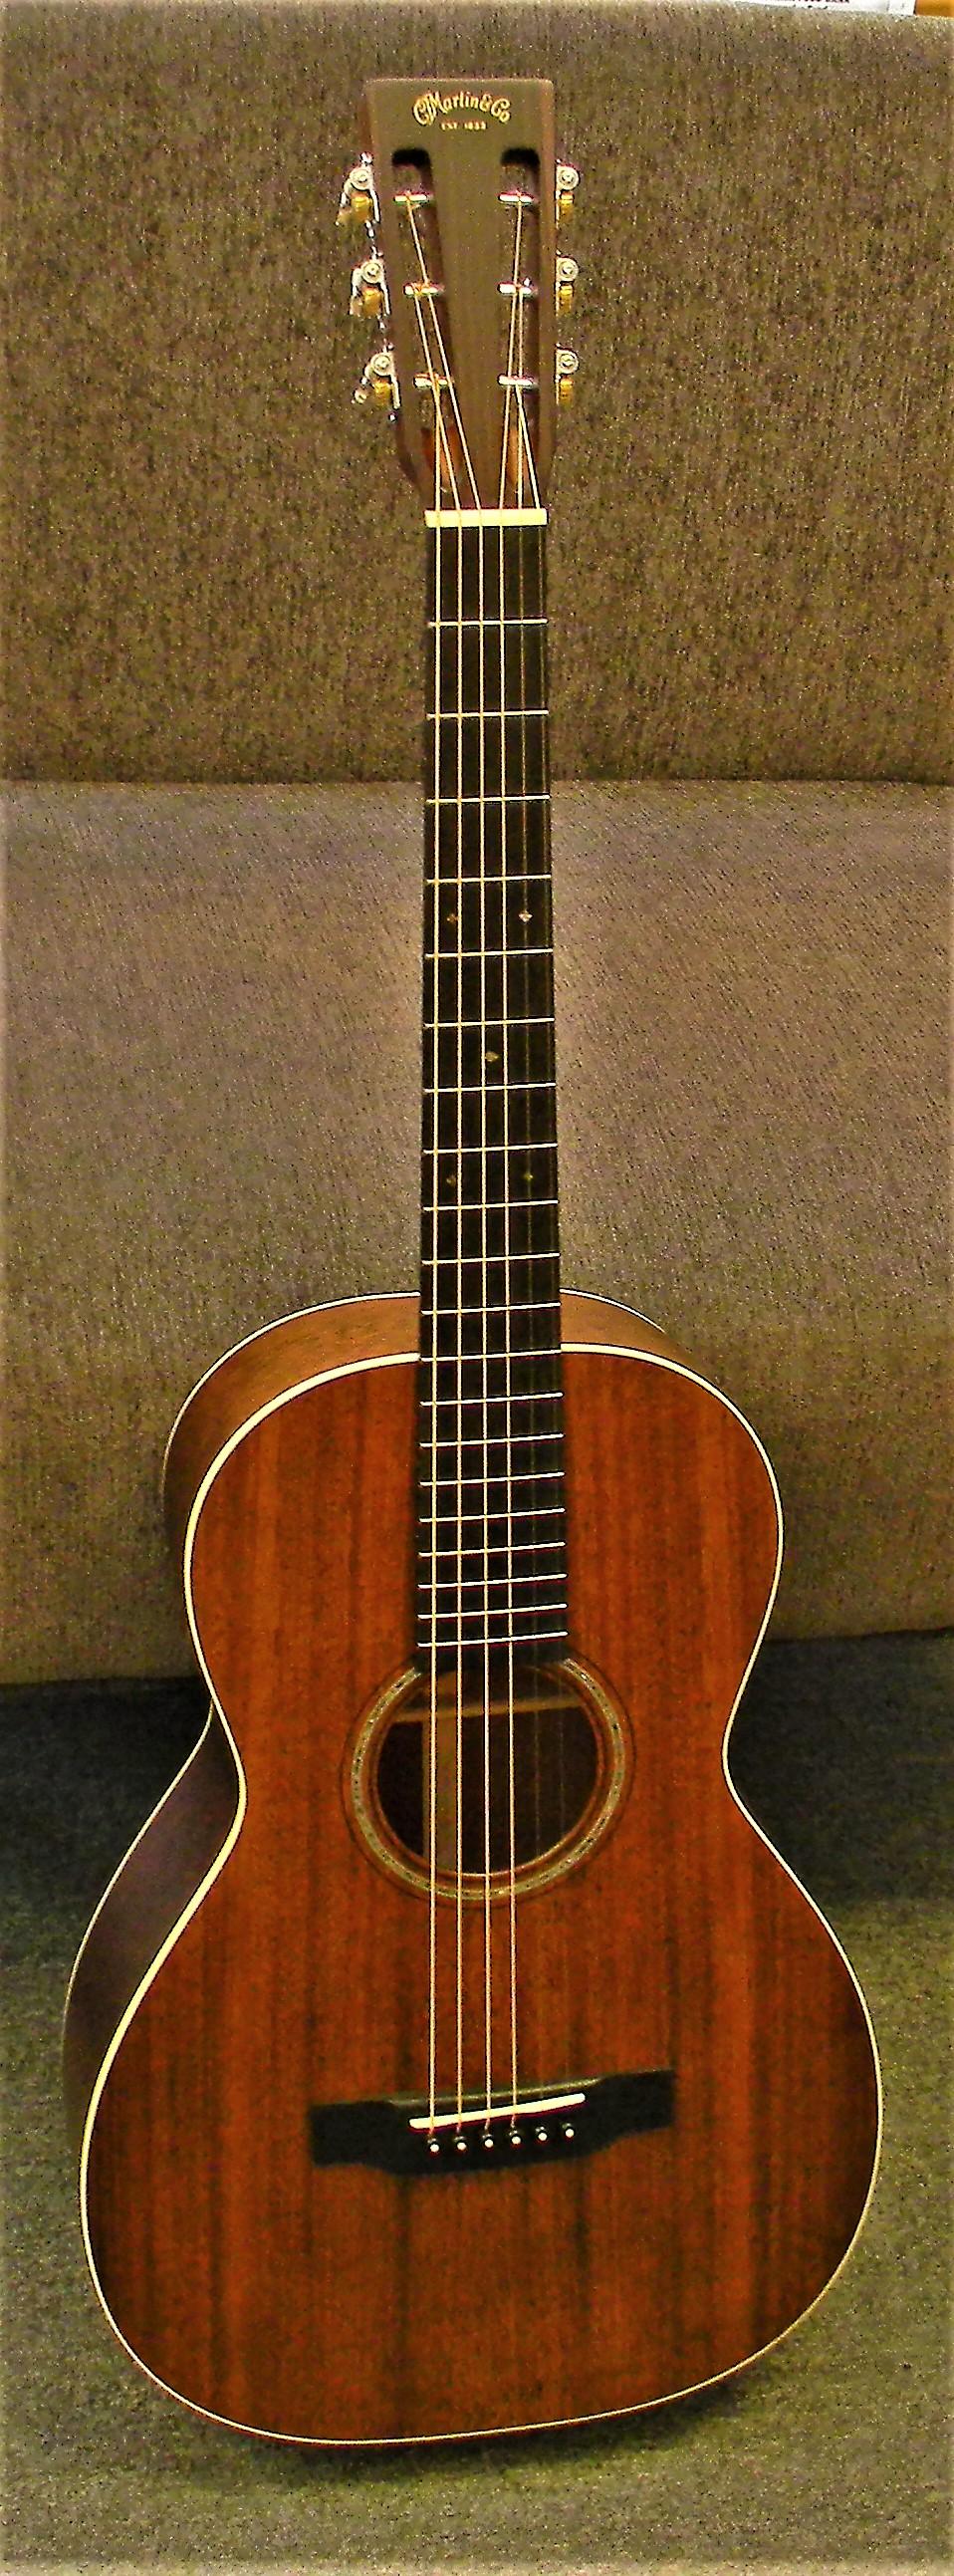 dscn8469 san antonio guitar store guitar tex. Black Bedroom Furniture Sets. Home Design Ideas